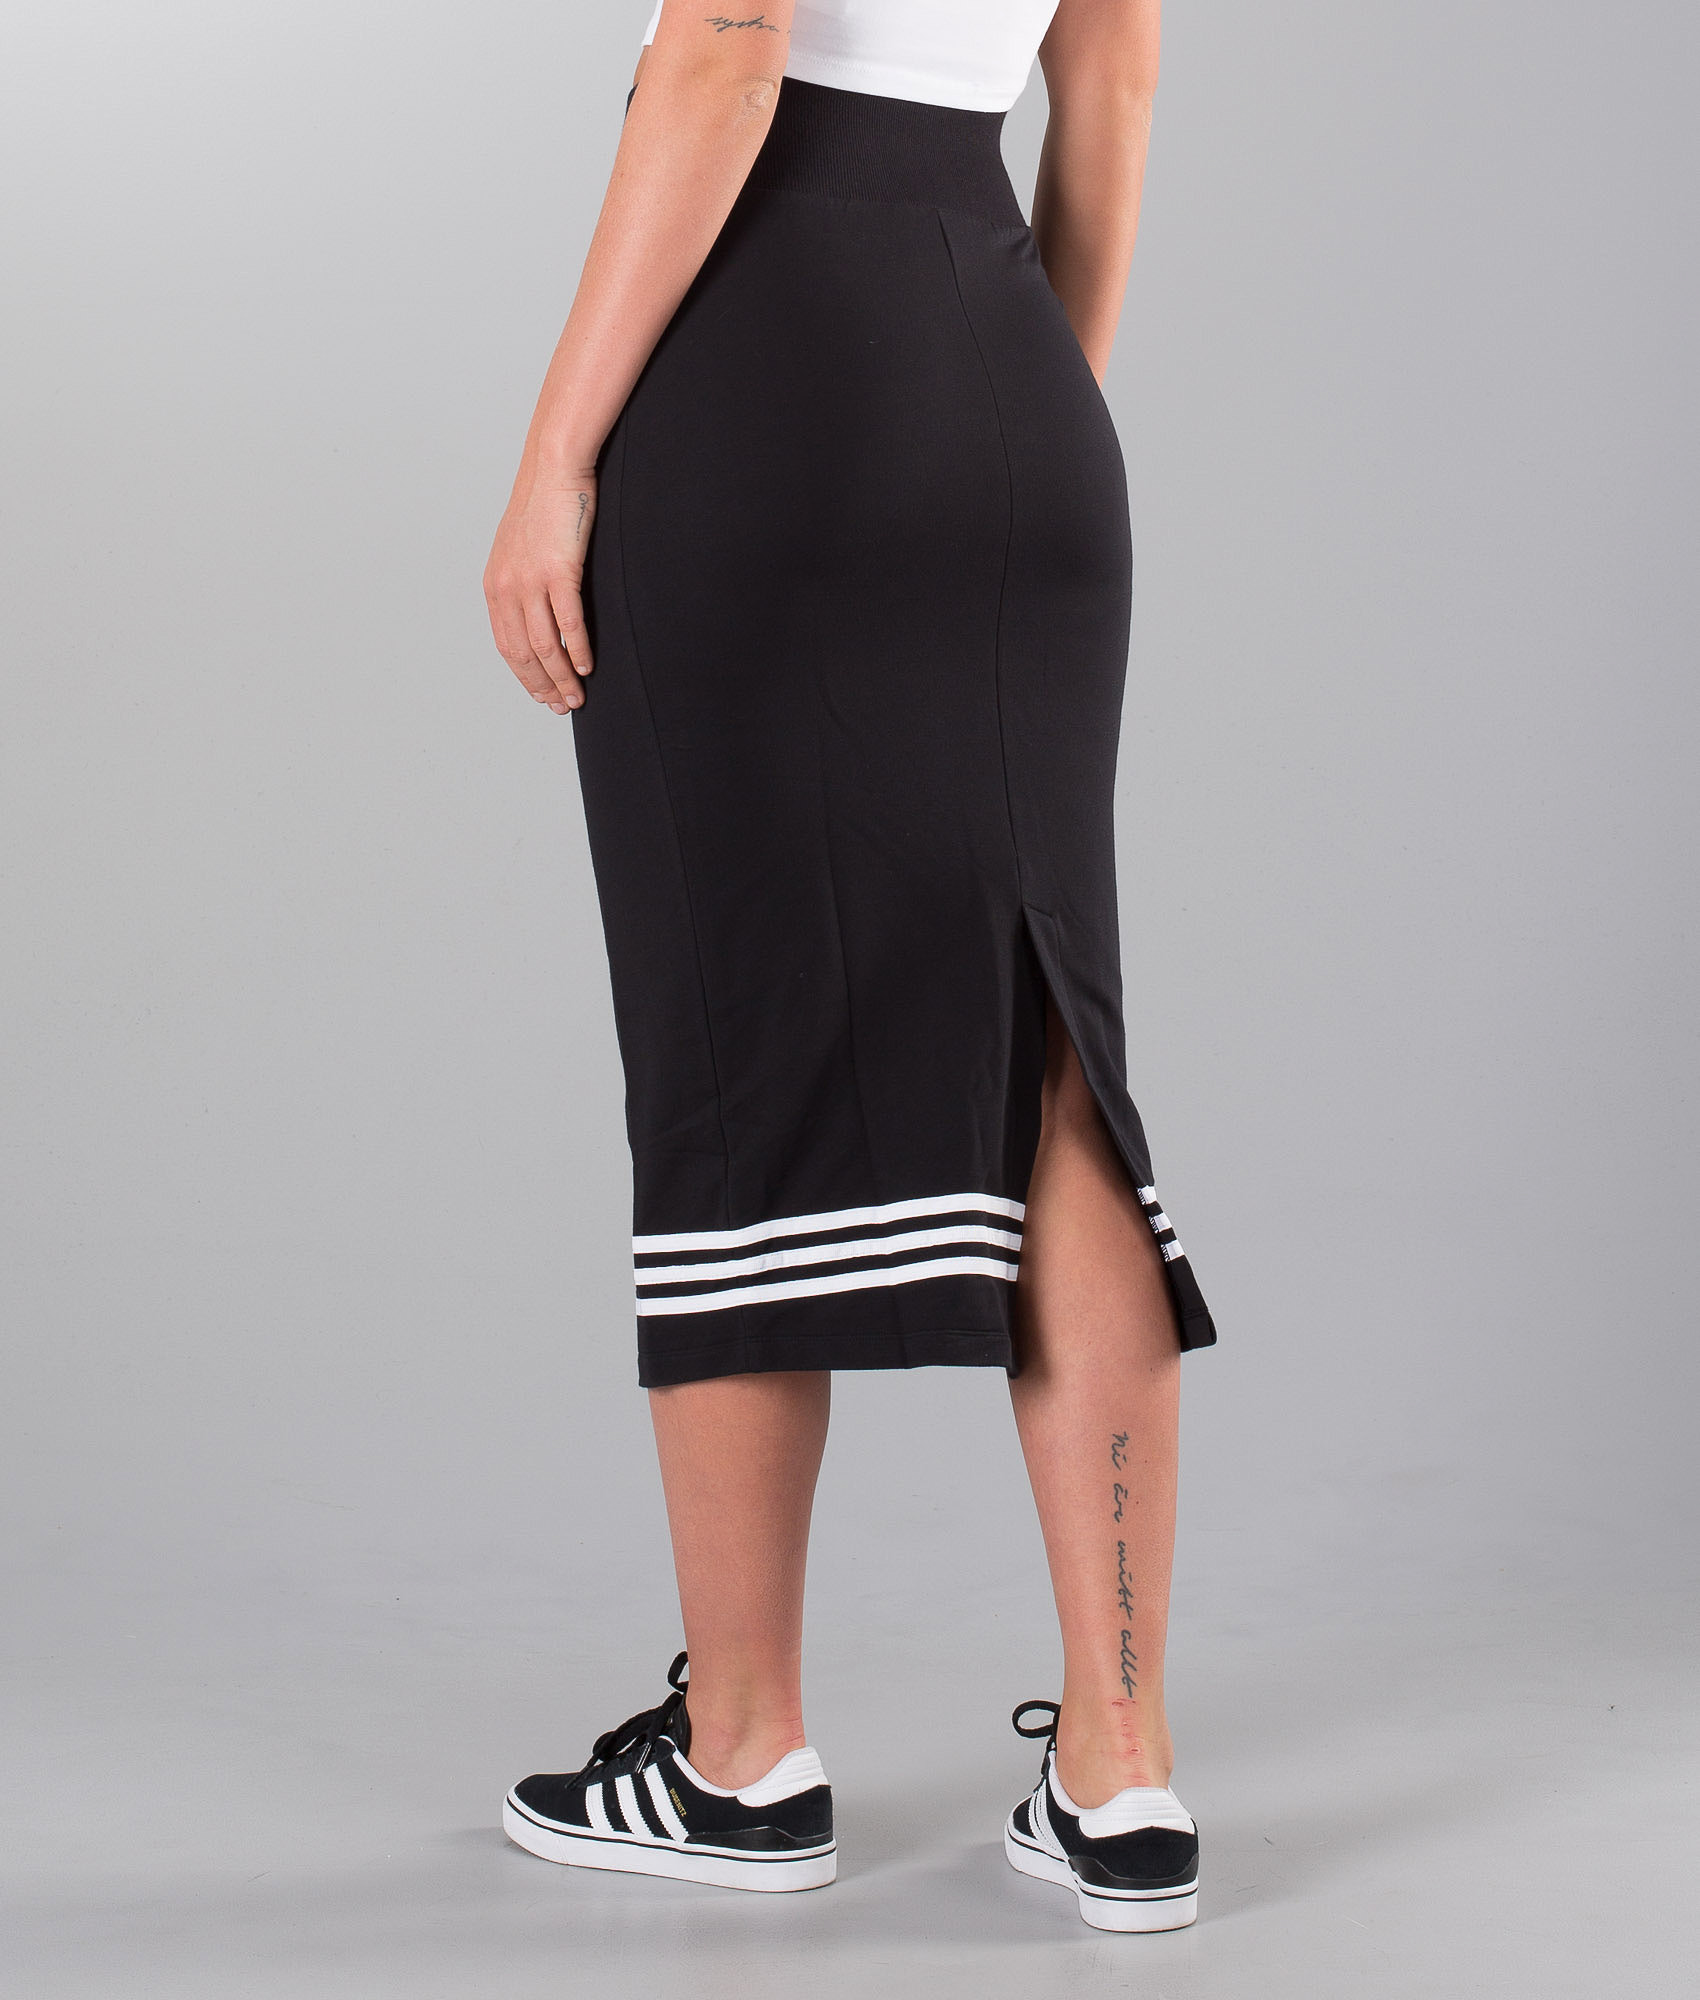 5a873c63 Adidas Originals Skirt Skjørt Black - Ridestore.no